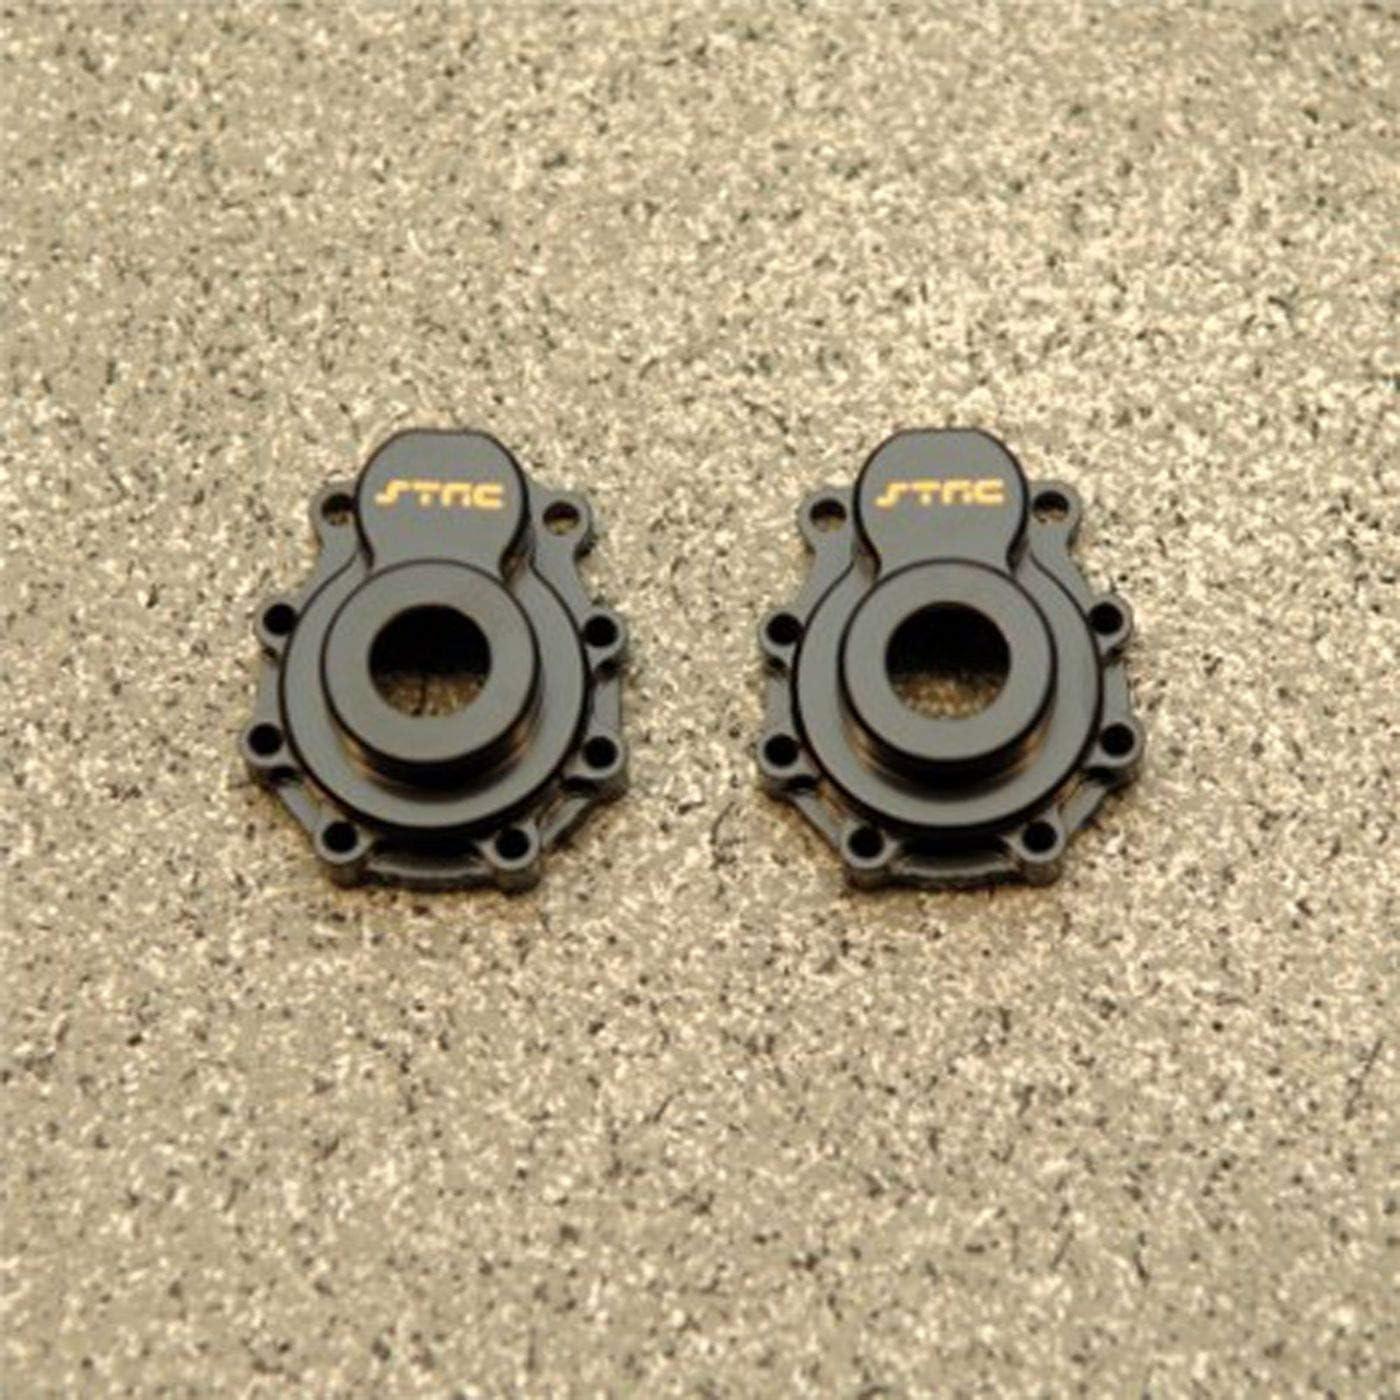 ST Racing ST8232BR Traxxas TRX-4 Brass Front Caster Blocks Black 2